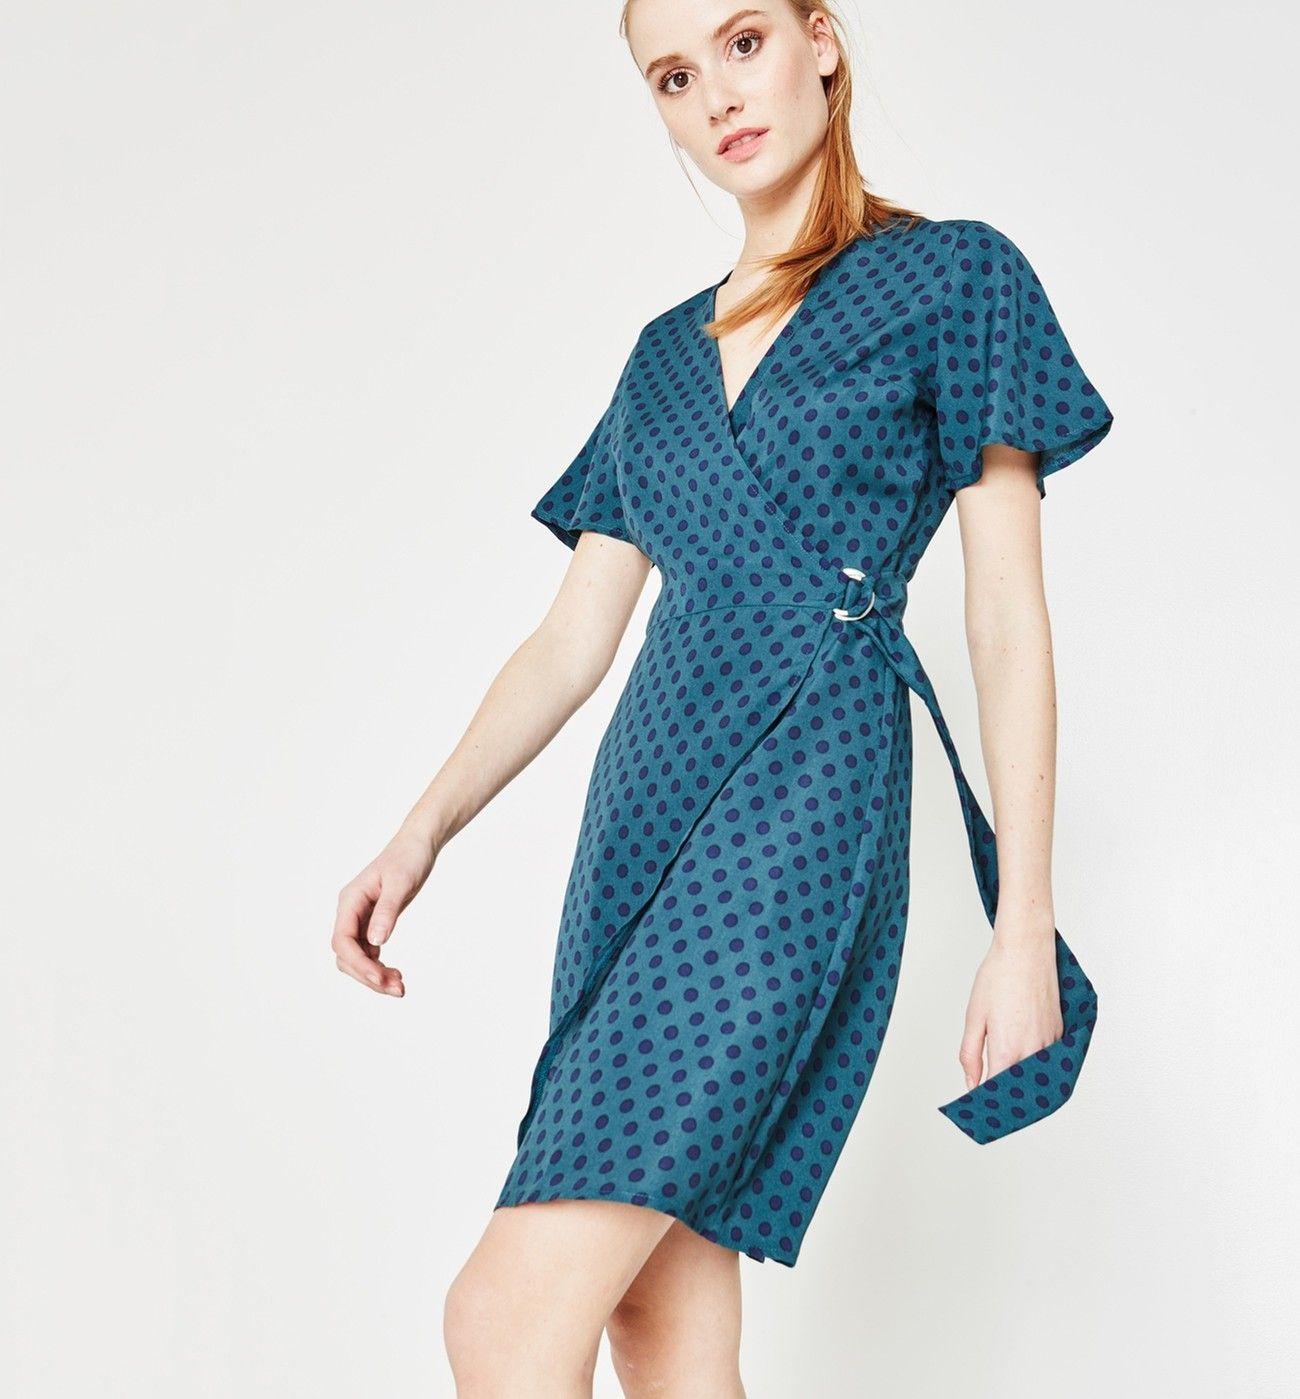 479a3abd84c28 Robe portefeuille Femme - Imprimé vert émeraude - Robes - Femme - Promod